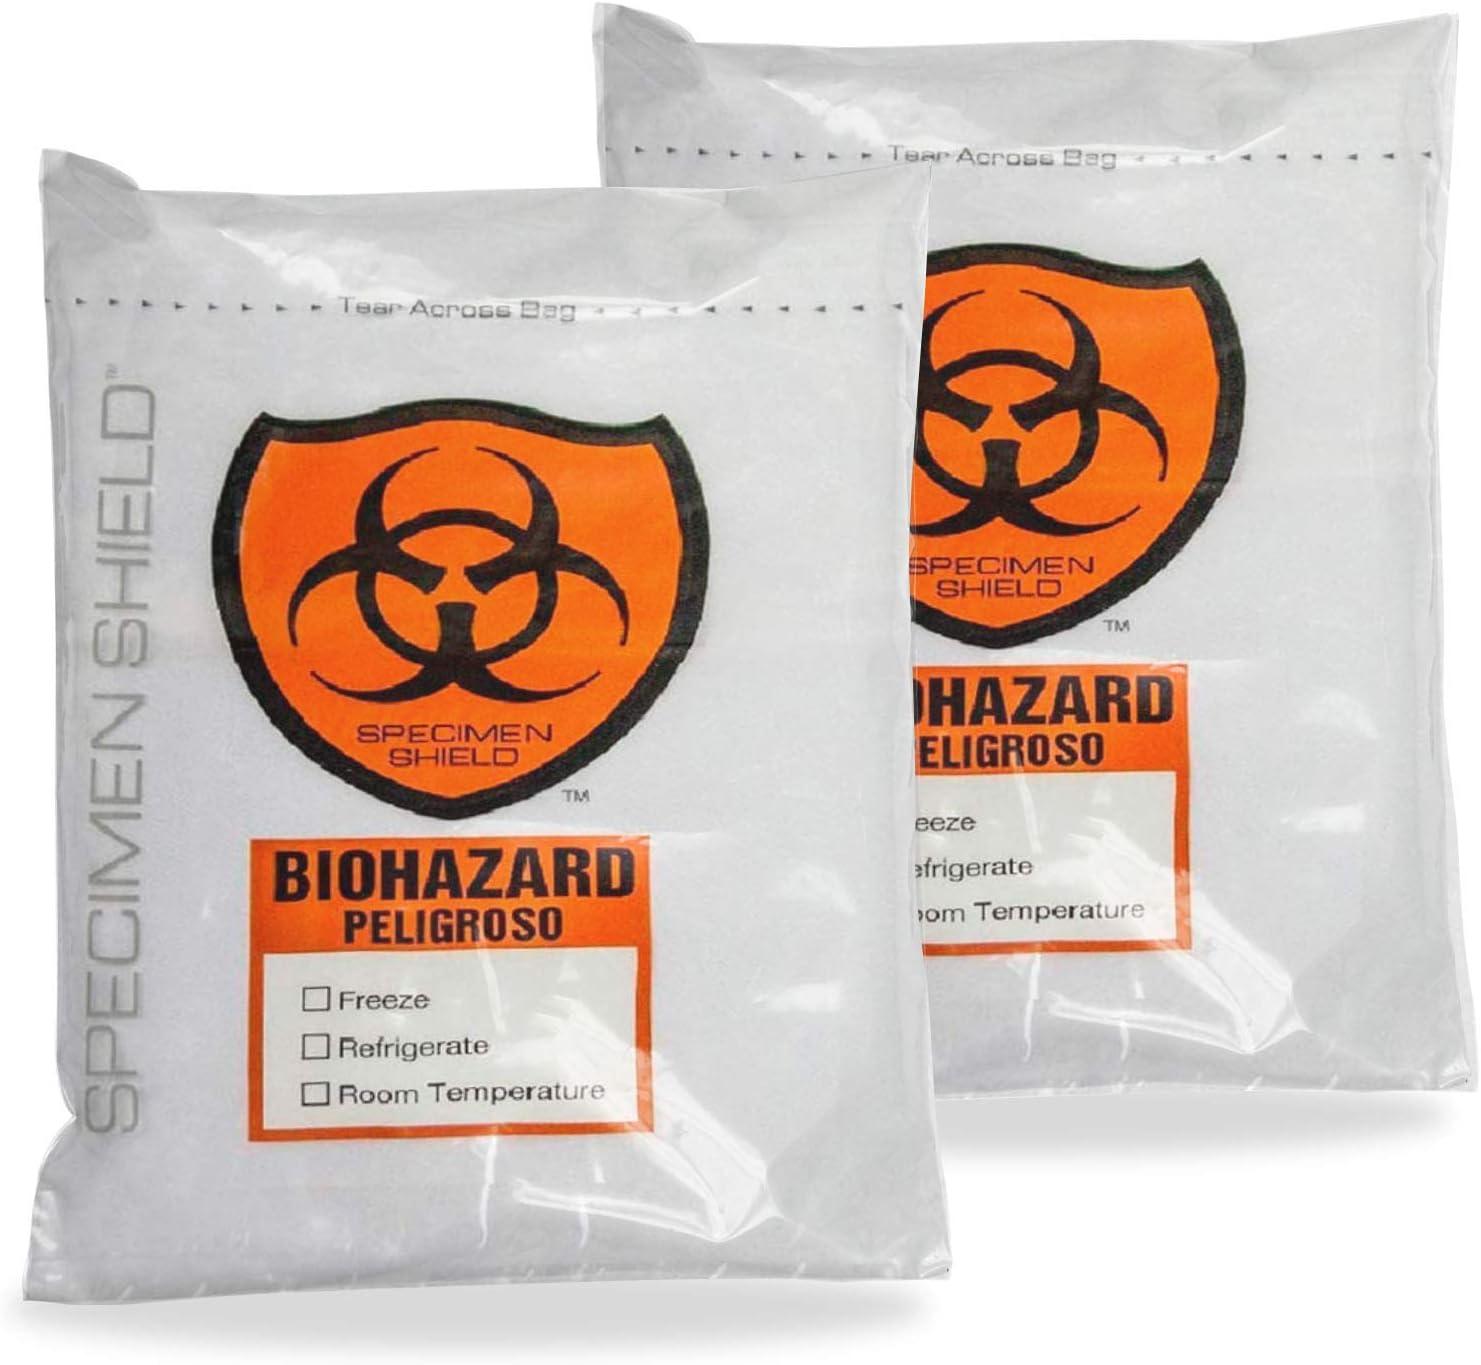 gift 100% quality warranty! APQ Pack of 2000 Biohazard 3 Wall Specimen Zipper Bags 8 B 10. x